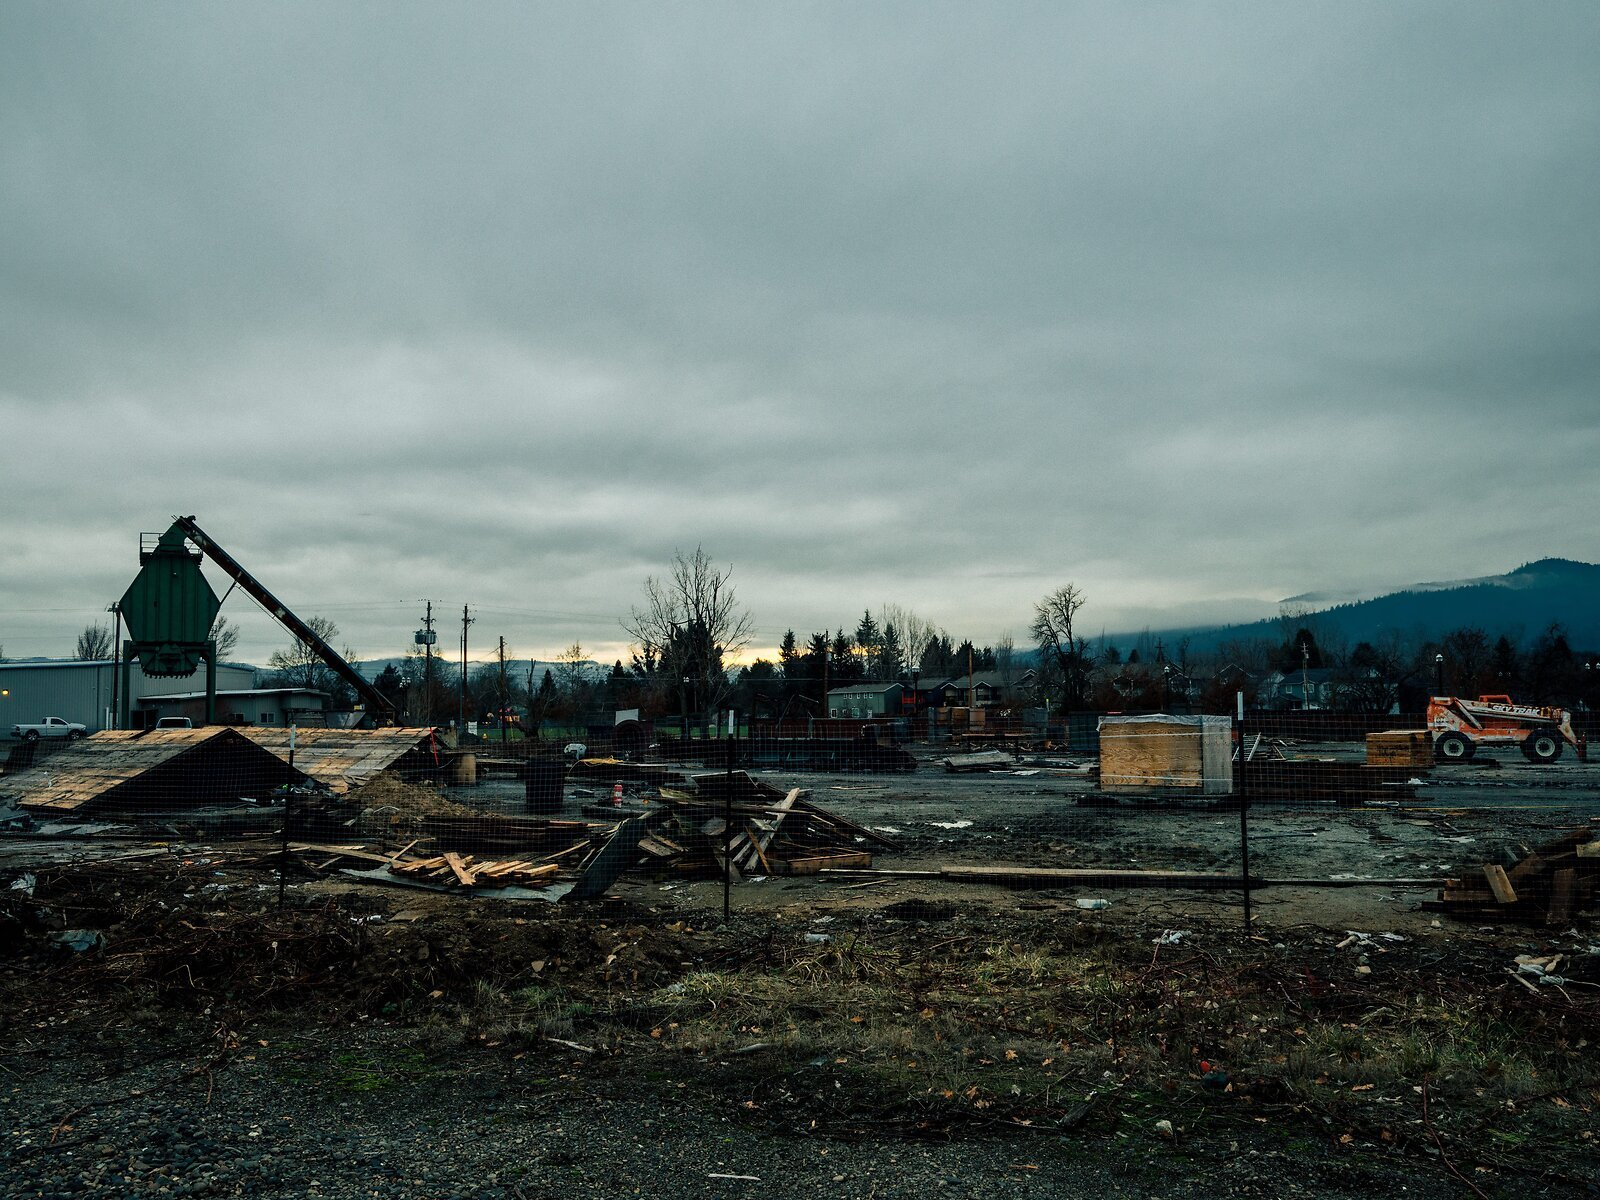 PenF_Jan15_21_Medord_Oregon_Industrial.jpg